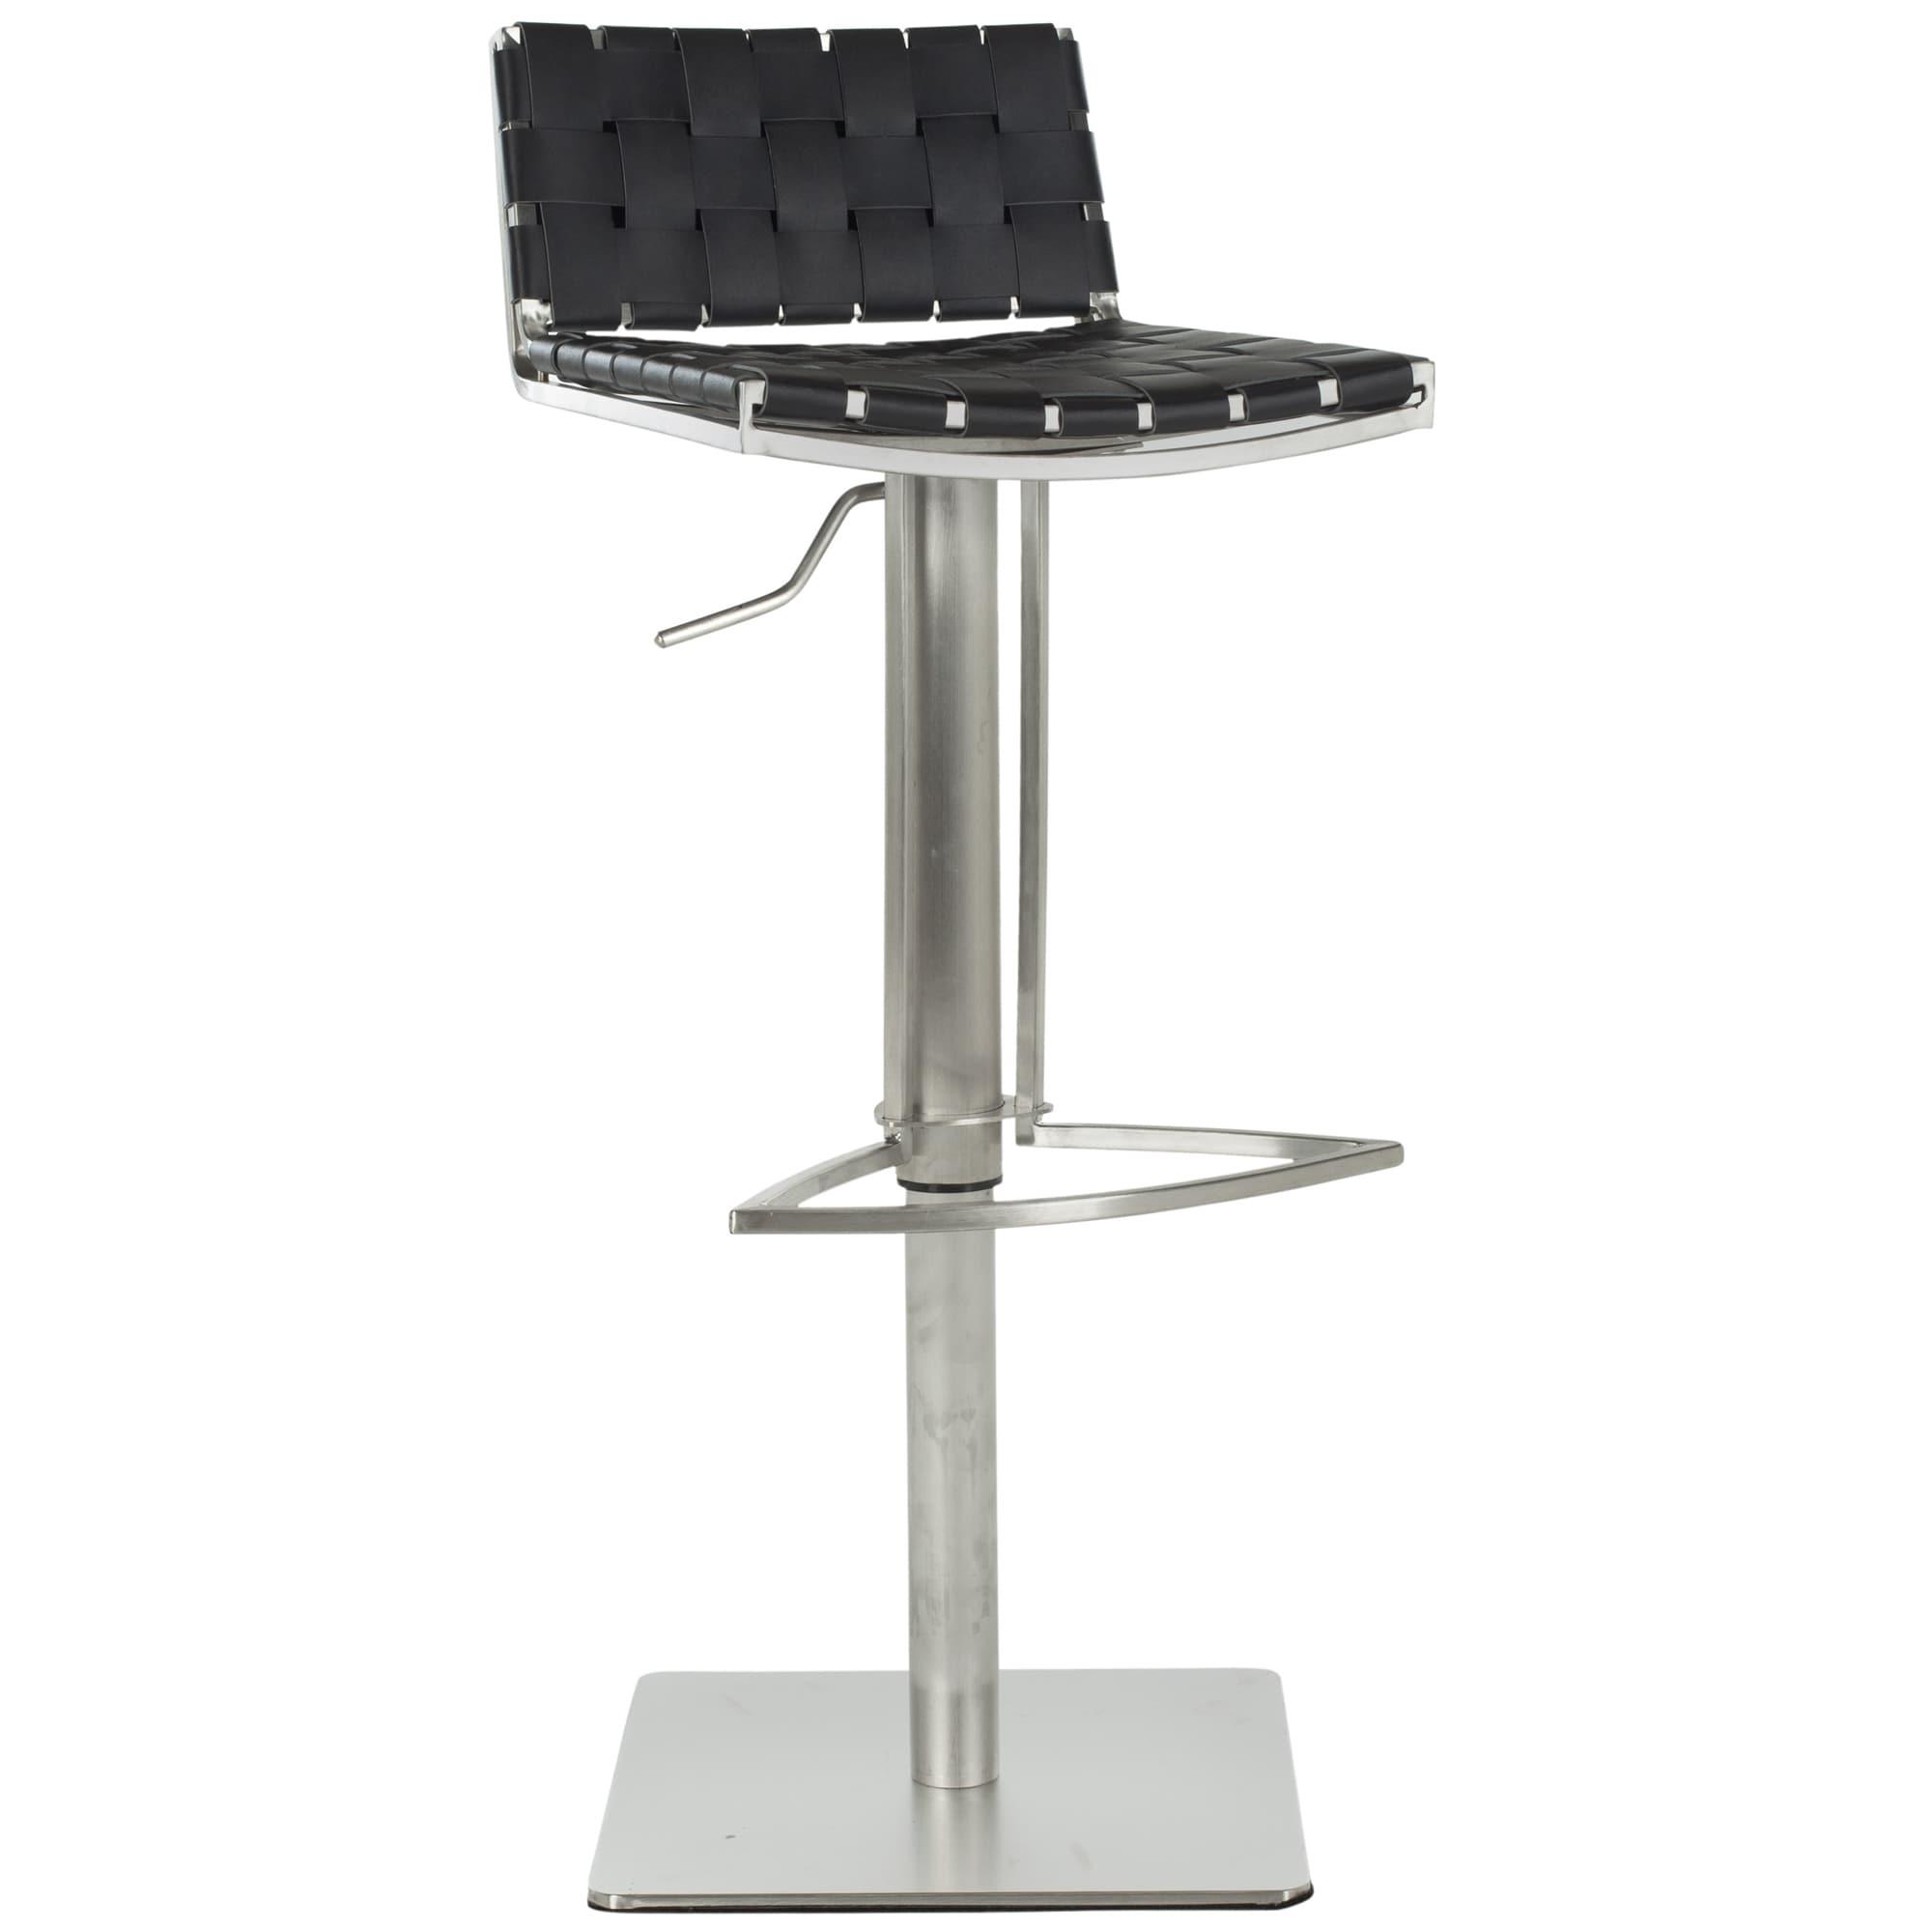 Fine Safavieh Mitchell Black Leather Seat Stainless Steel Adjustable 22 31 Inch Modern Bar Stool 18 5 X 15 4 X 29 5 Squirreltailoven Fun Painted Chair Ideas Images Squirreltailovenorg